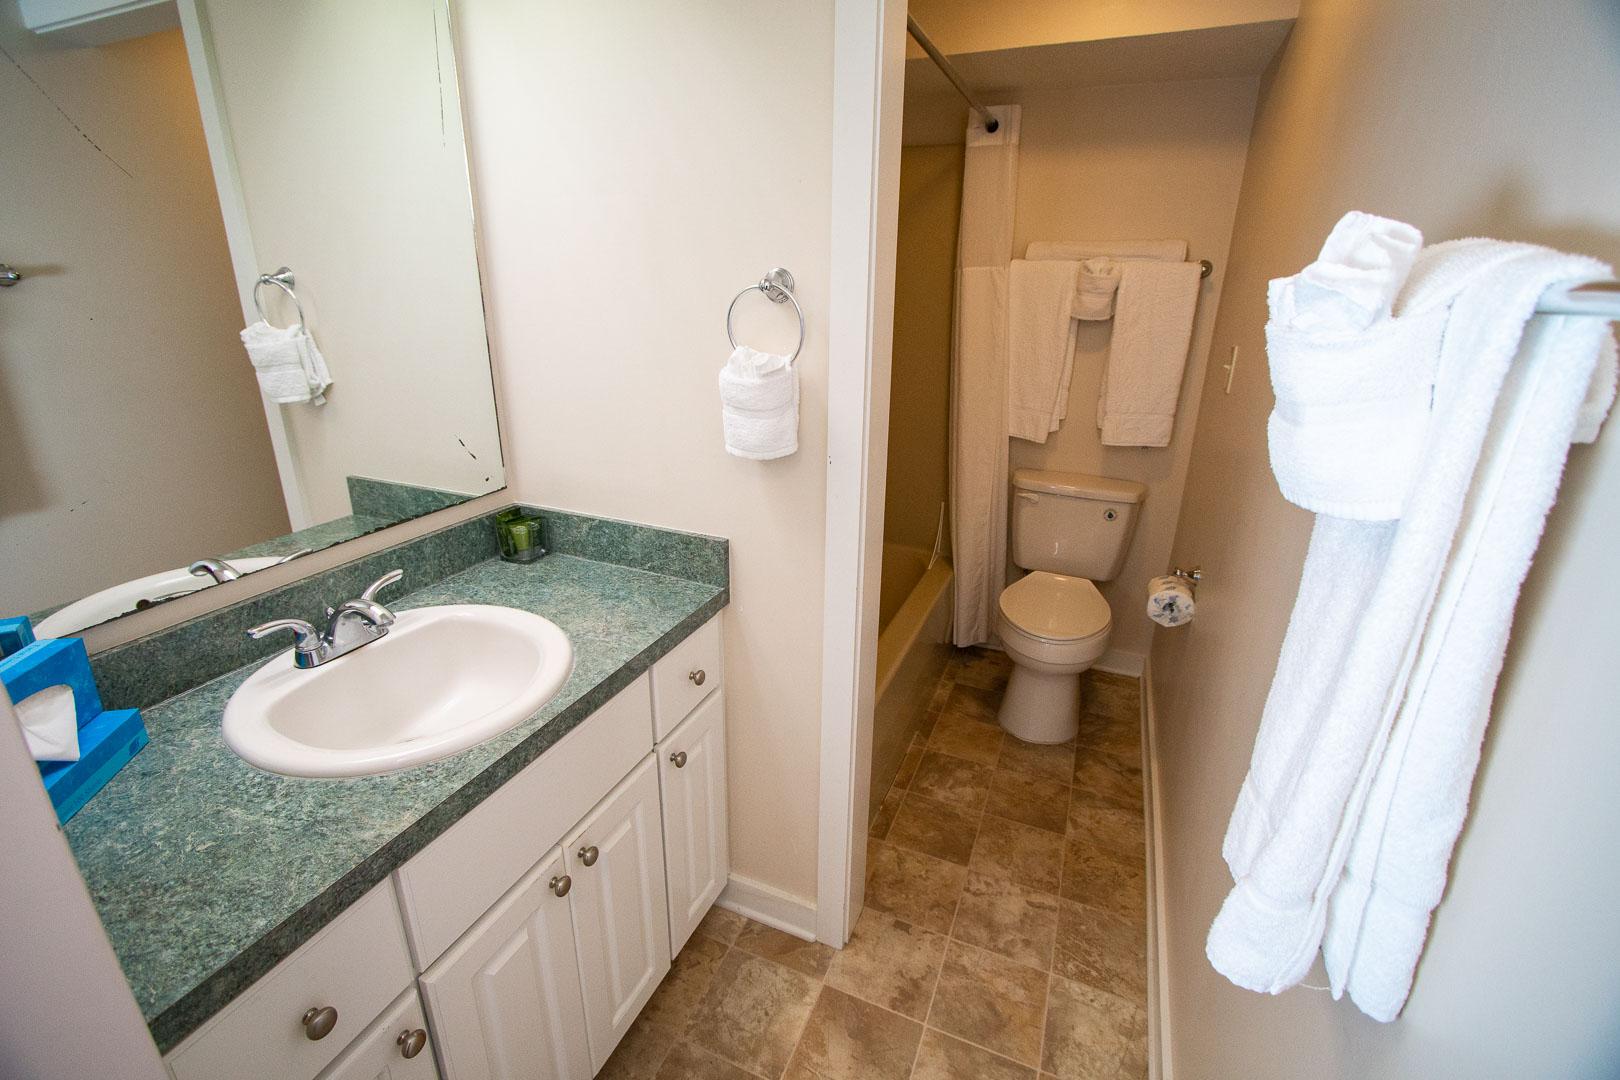 A clean bathroom at VRI's Sandcastle Village in New Bern, North Carolina.